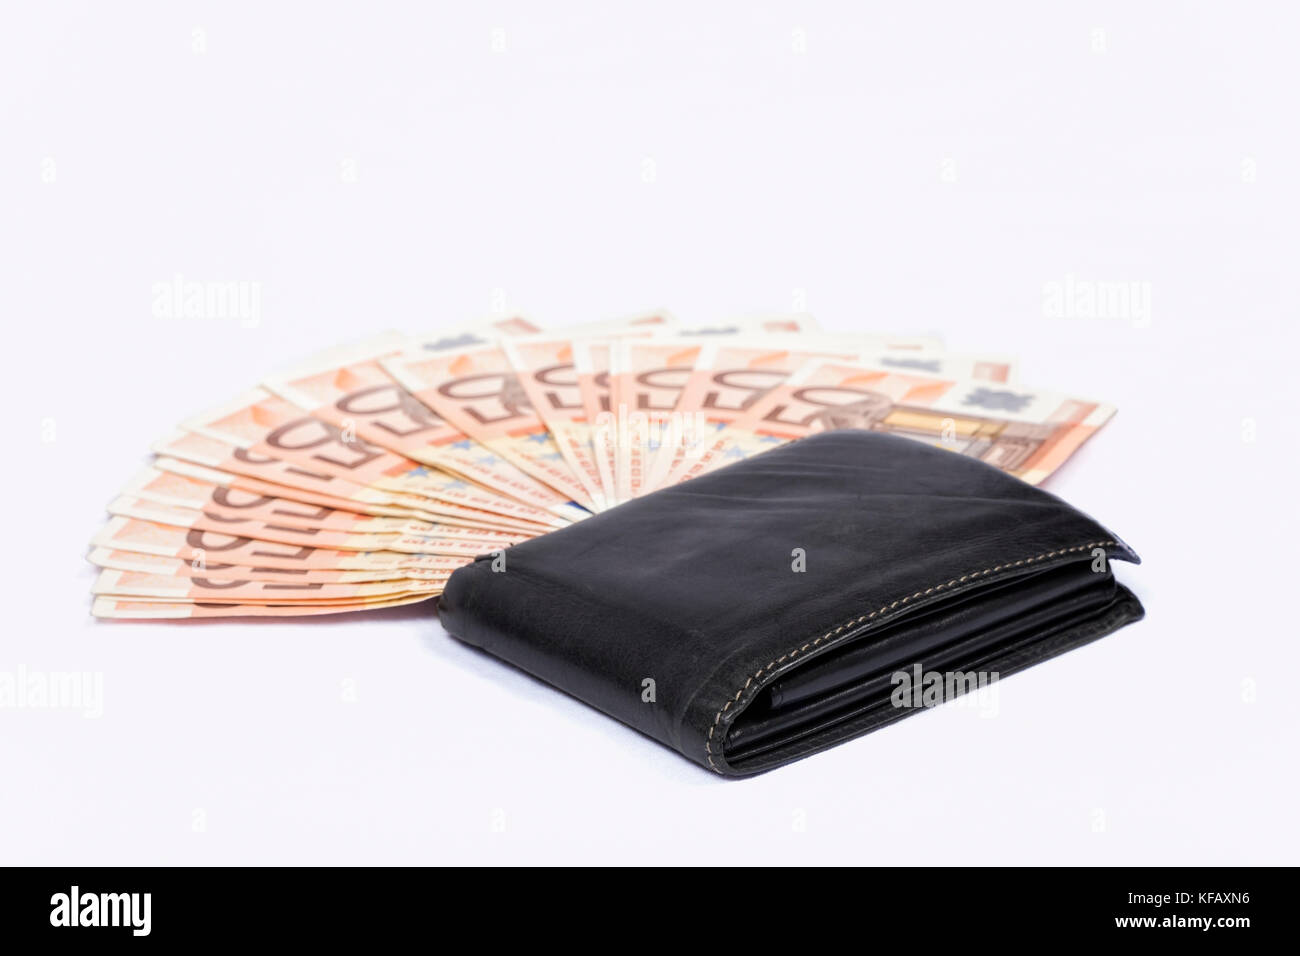 Wallet with money on white background. Euros. - Stock Image